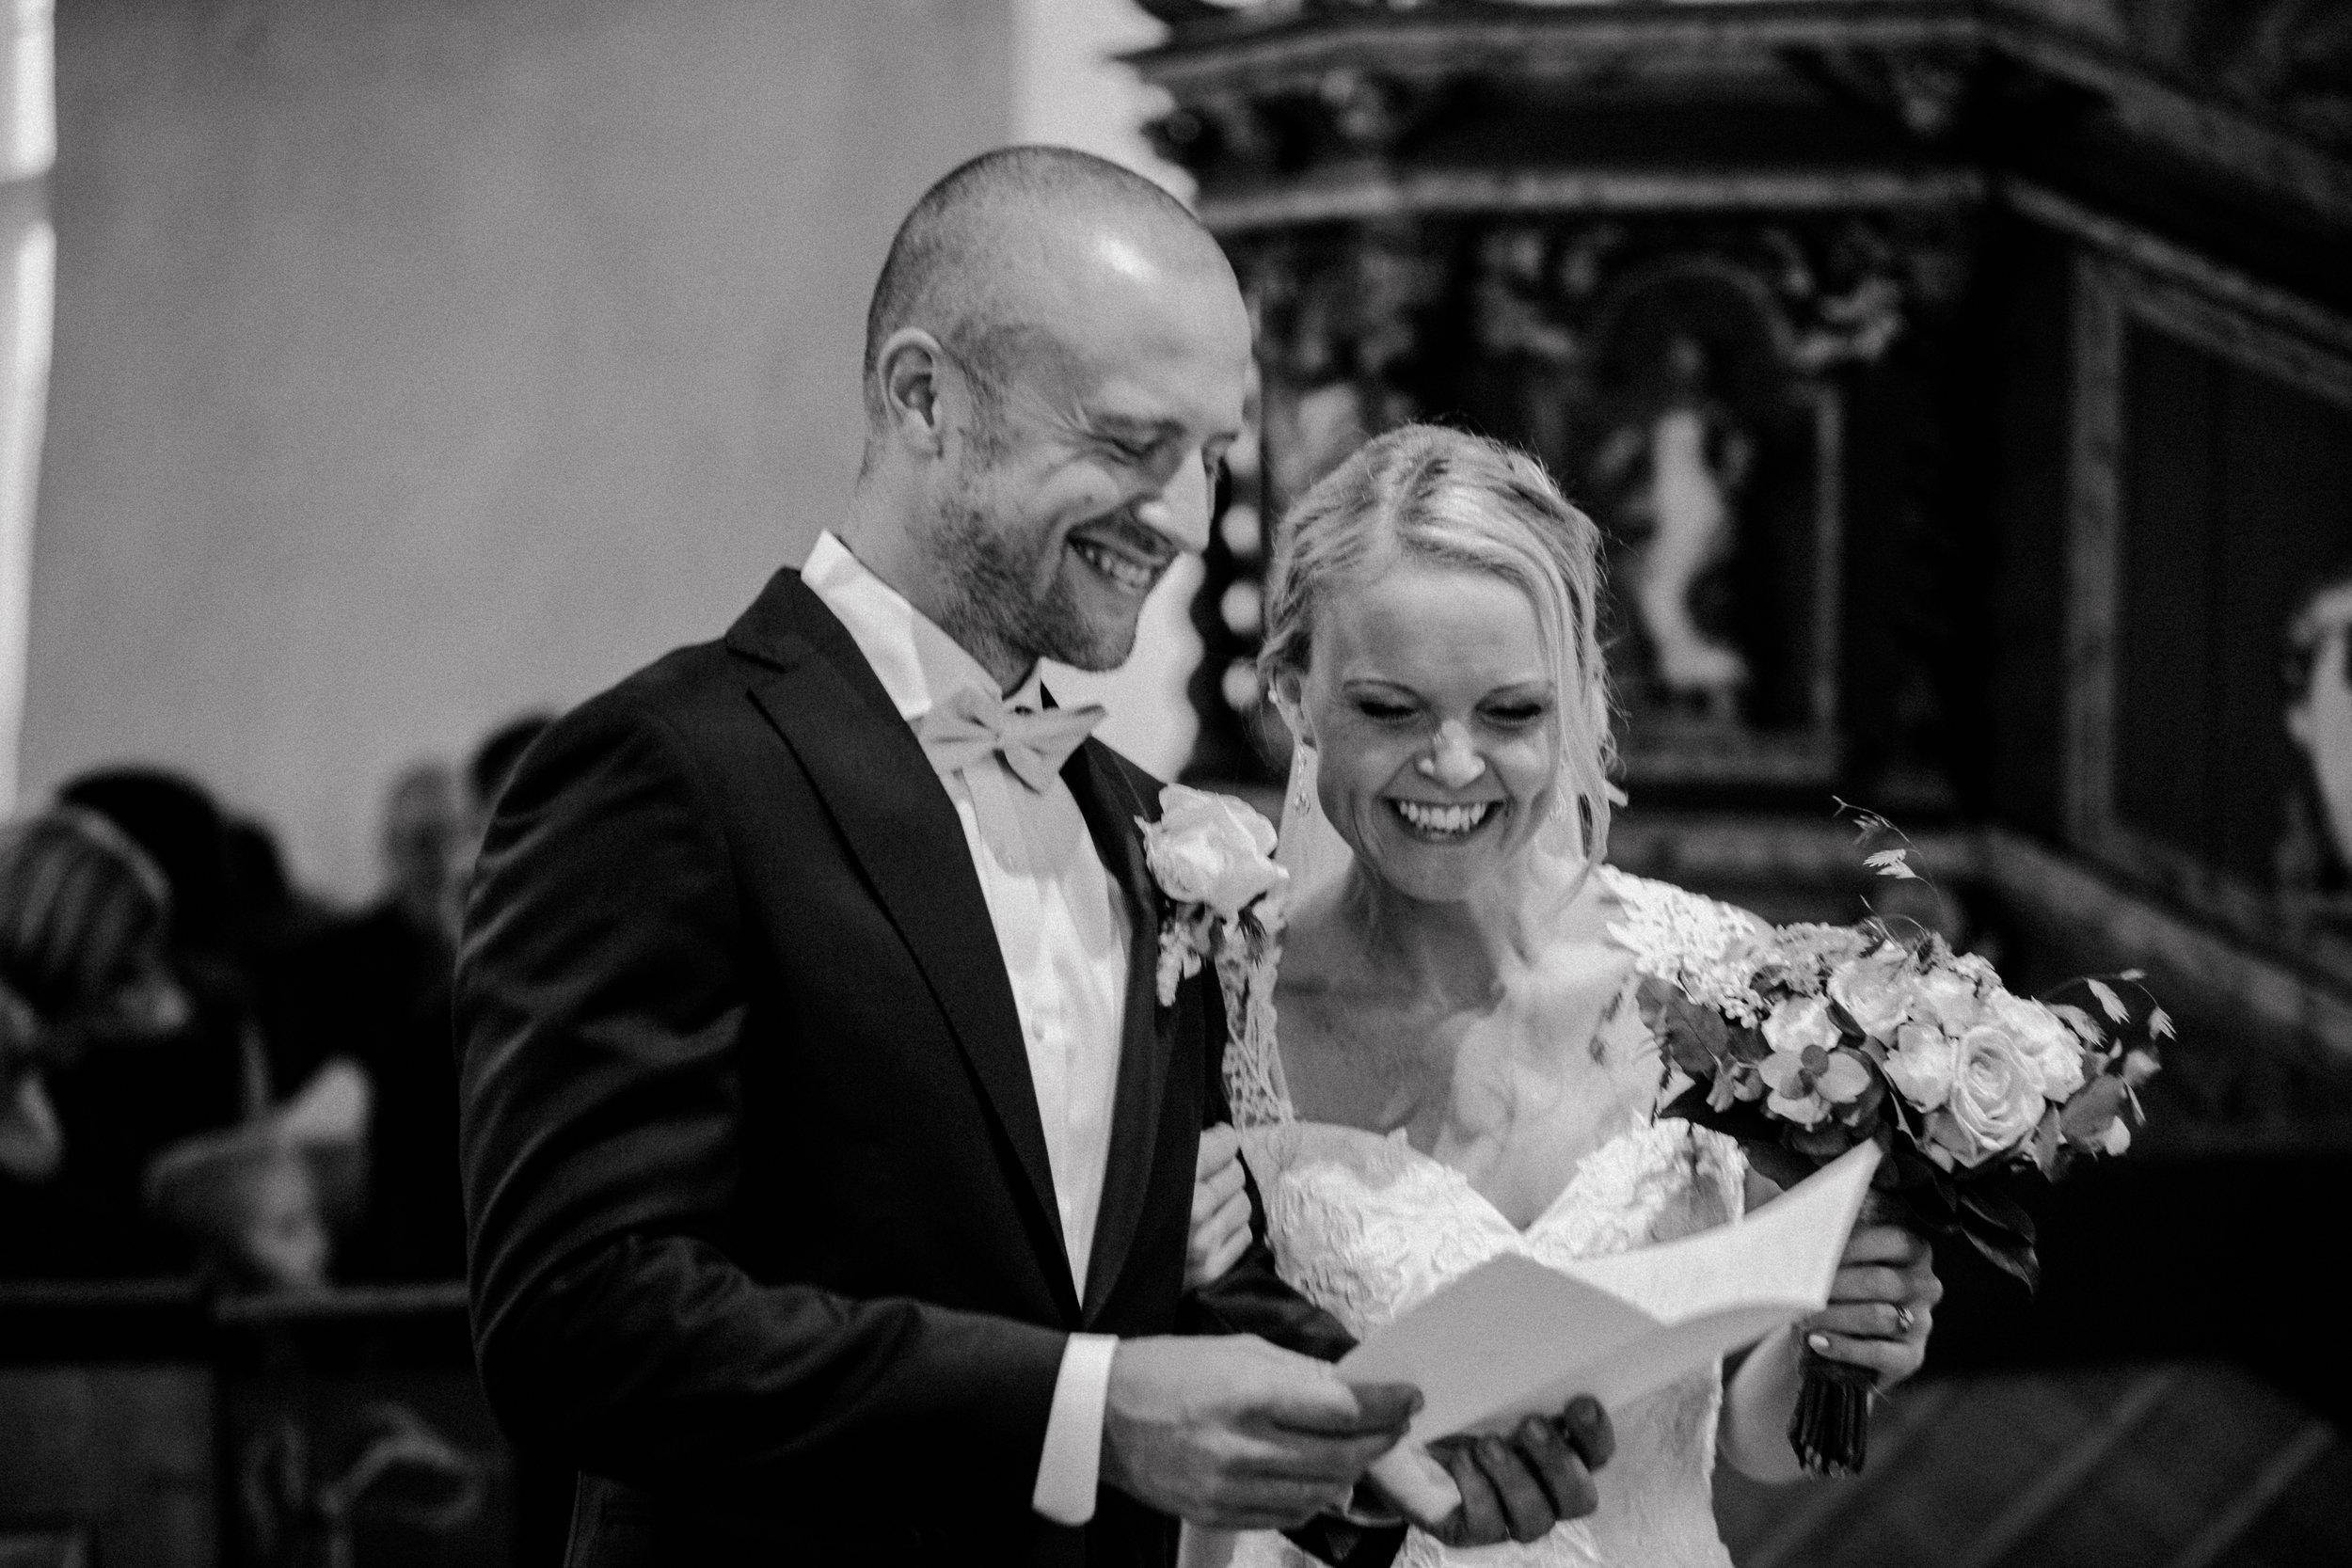 Bröllopsfotograf-Uddetorp Säteri-Höstbröllop-Fotograf Emilia- Bröllopsfotograf Borås-38.jpg